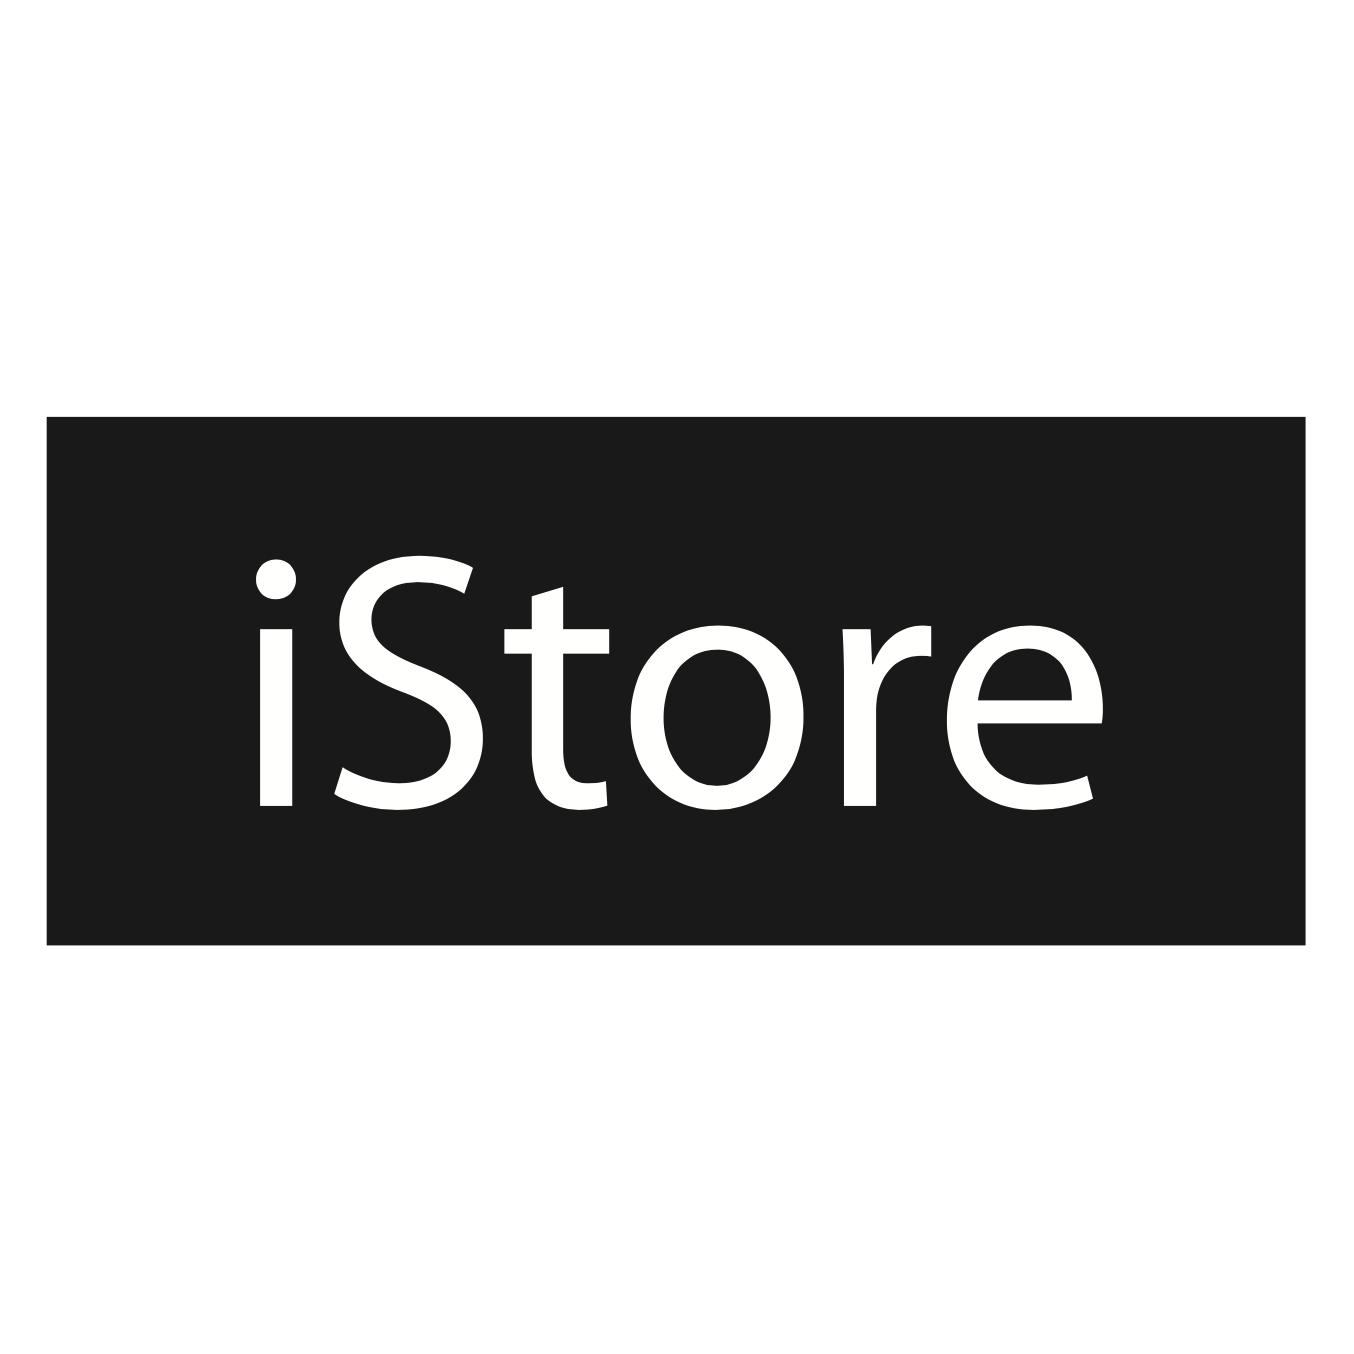 13-inch MacBook Pro | Apple M1 chip | 512GB - Silver